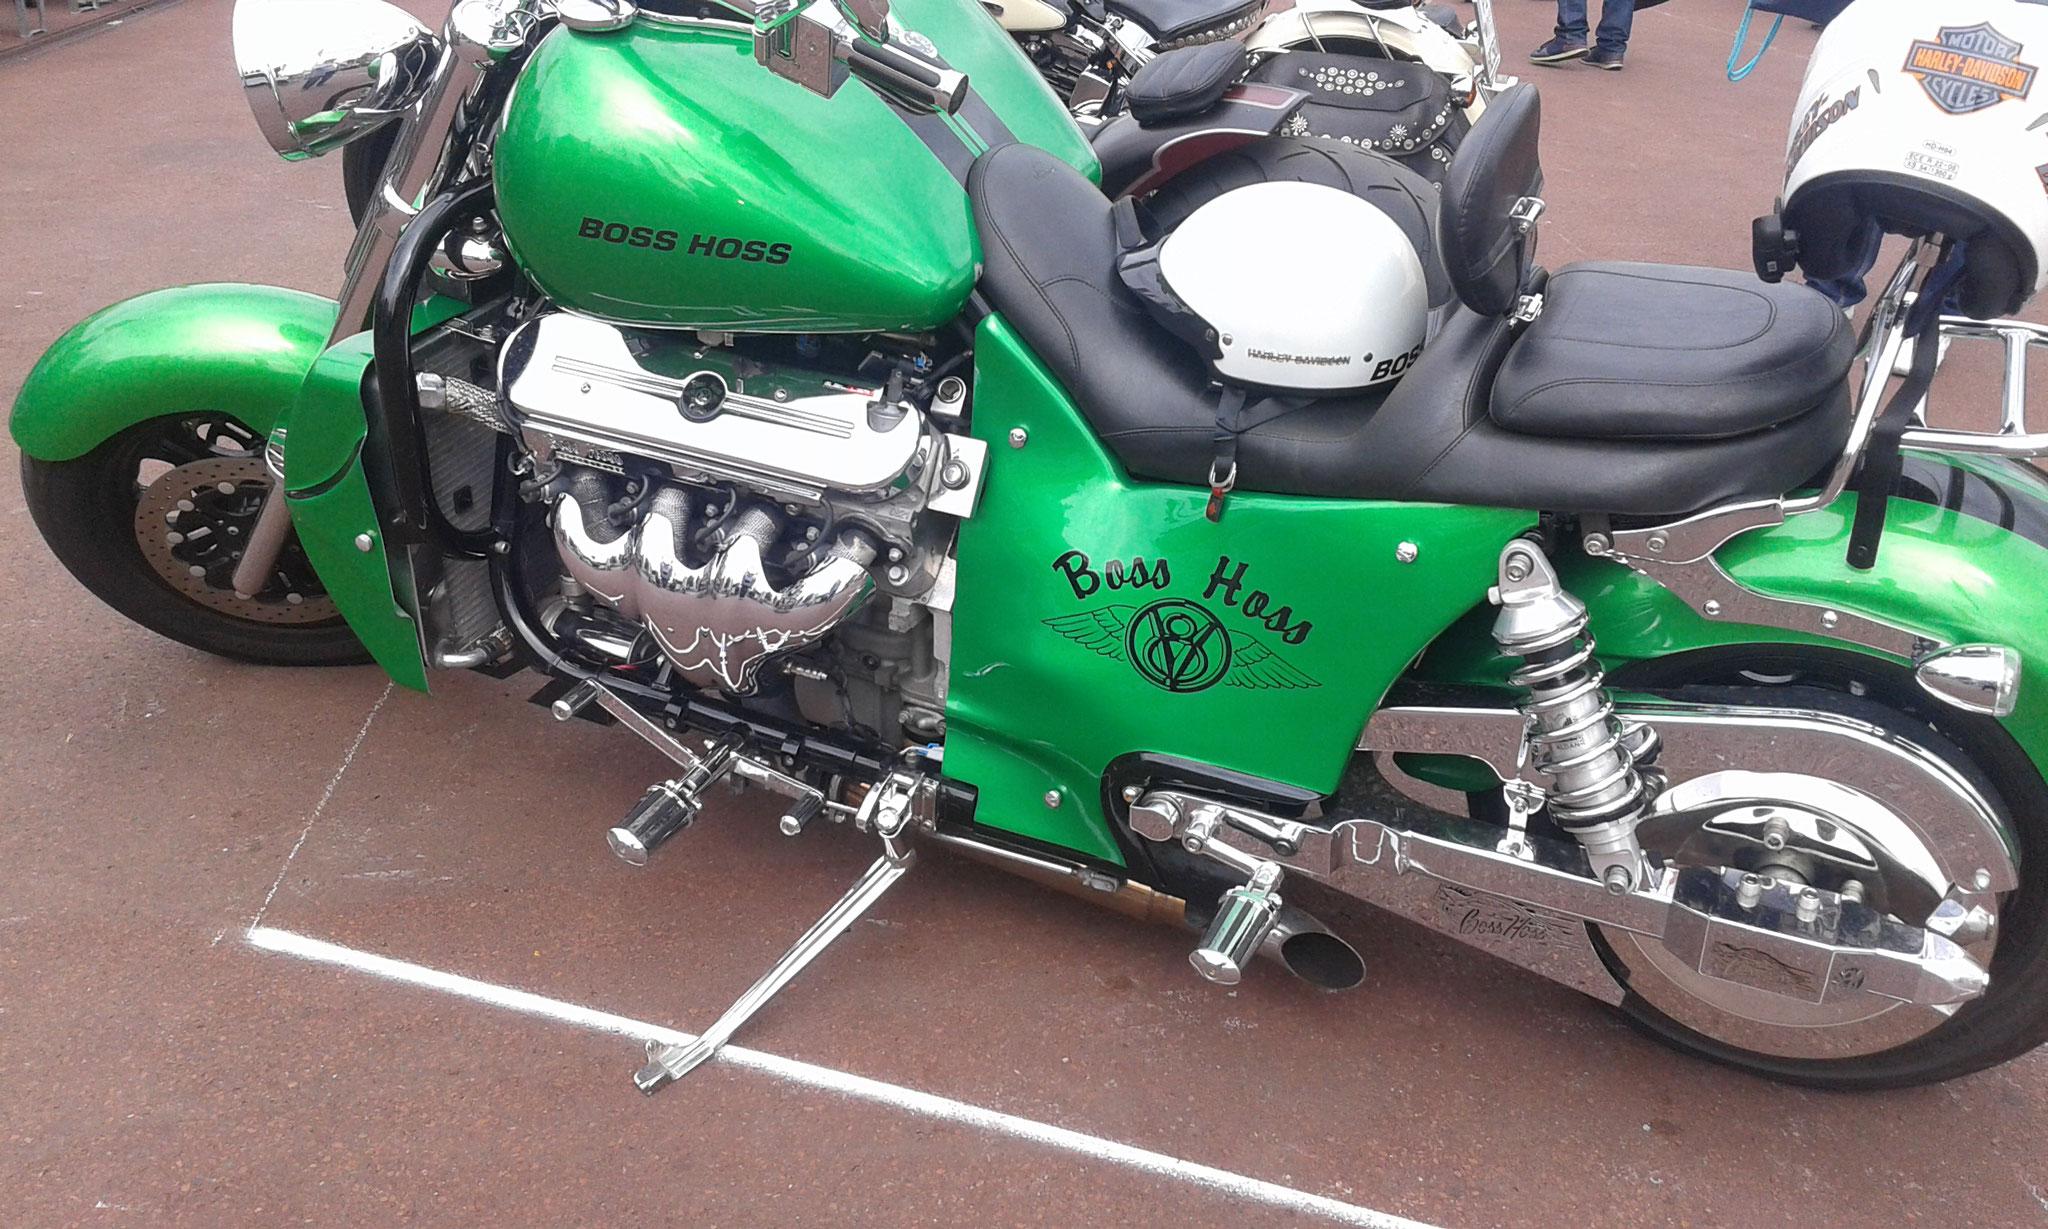 Impressionen Harley Days 2017 Spielbudenplatz Hamburg St. Pauli